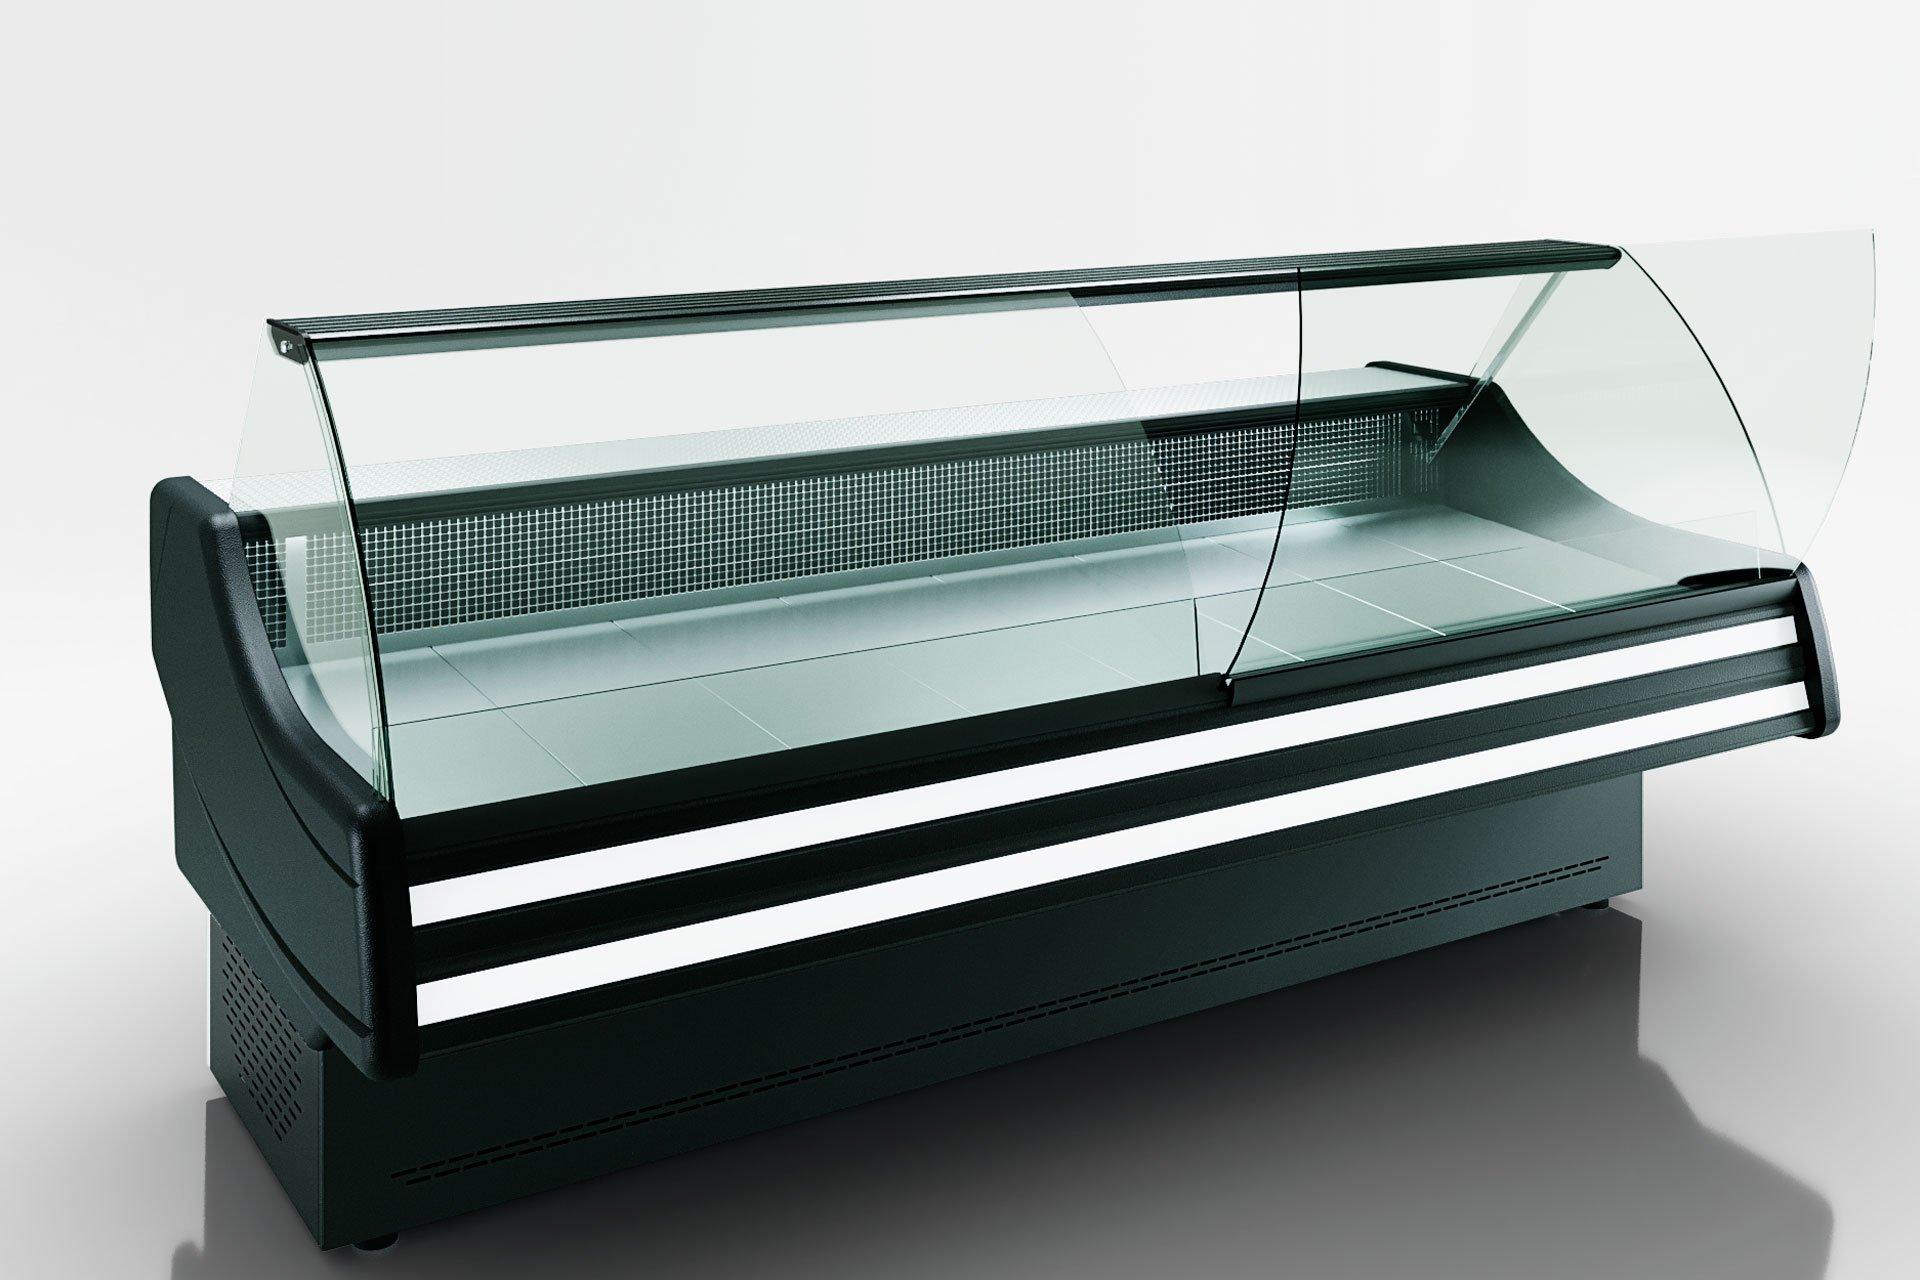 Sonata AG 120 deli OS 125-SBA